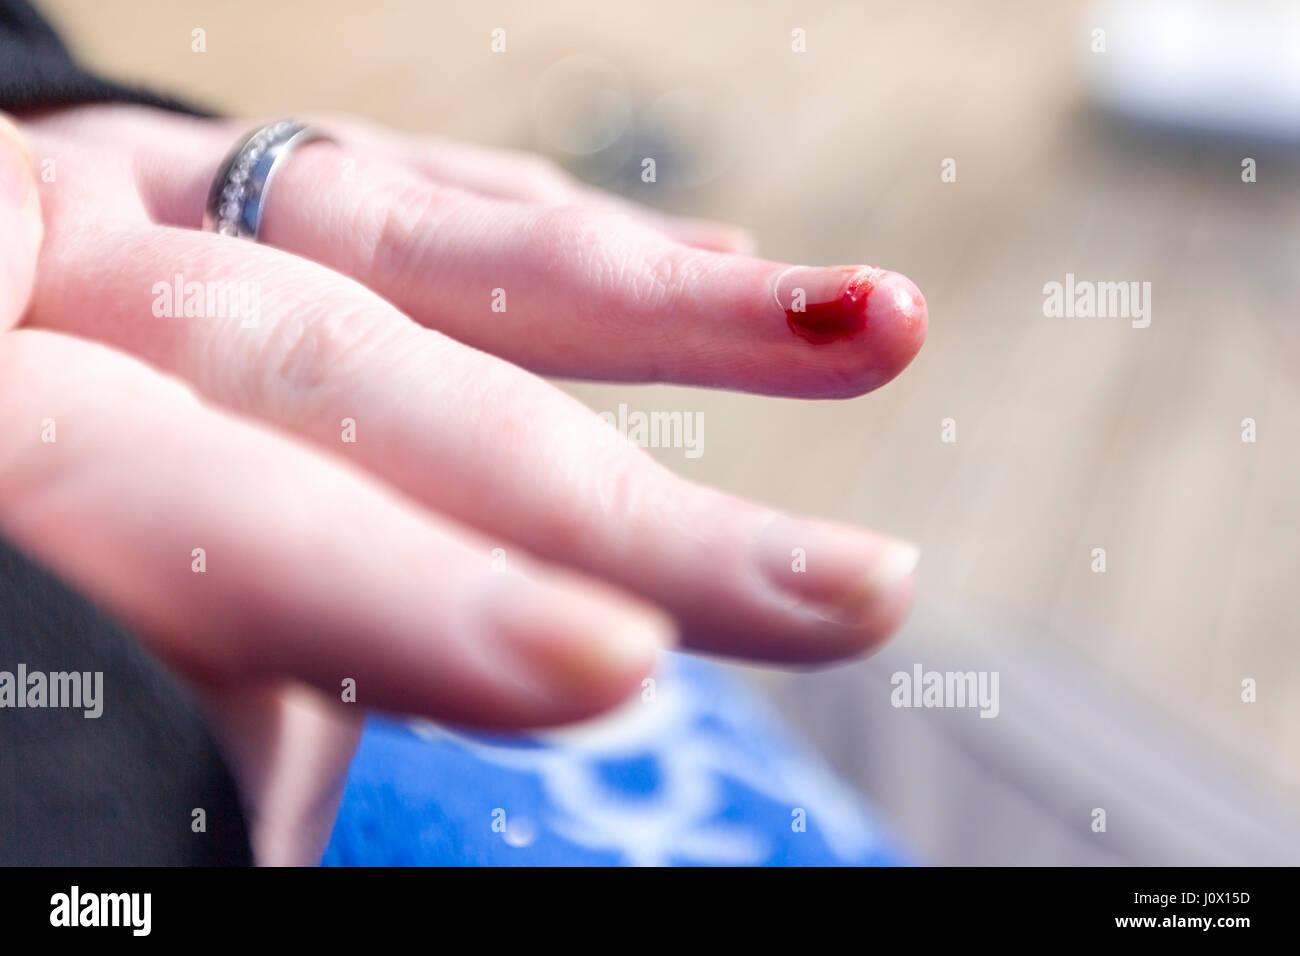 Blood Bleeding Hand Stock Photos & Blood Bleeding Hand Stock